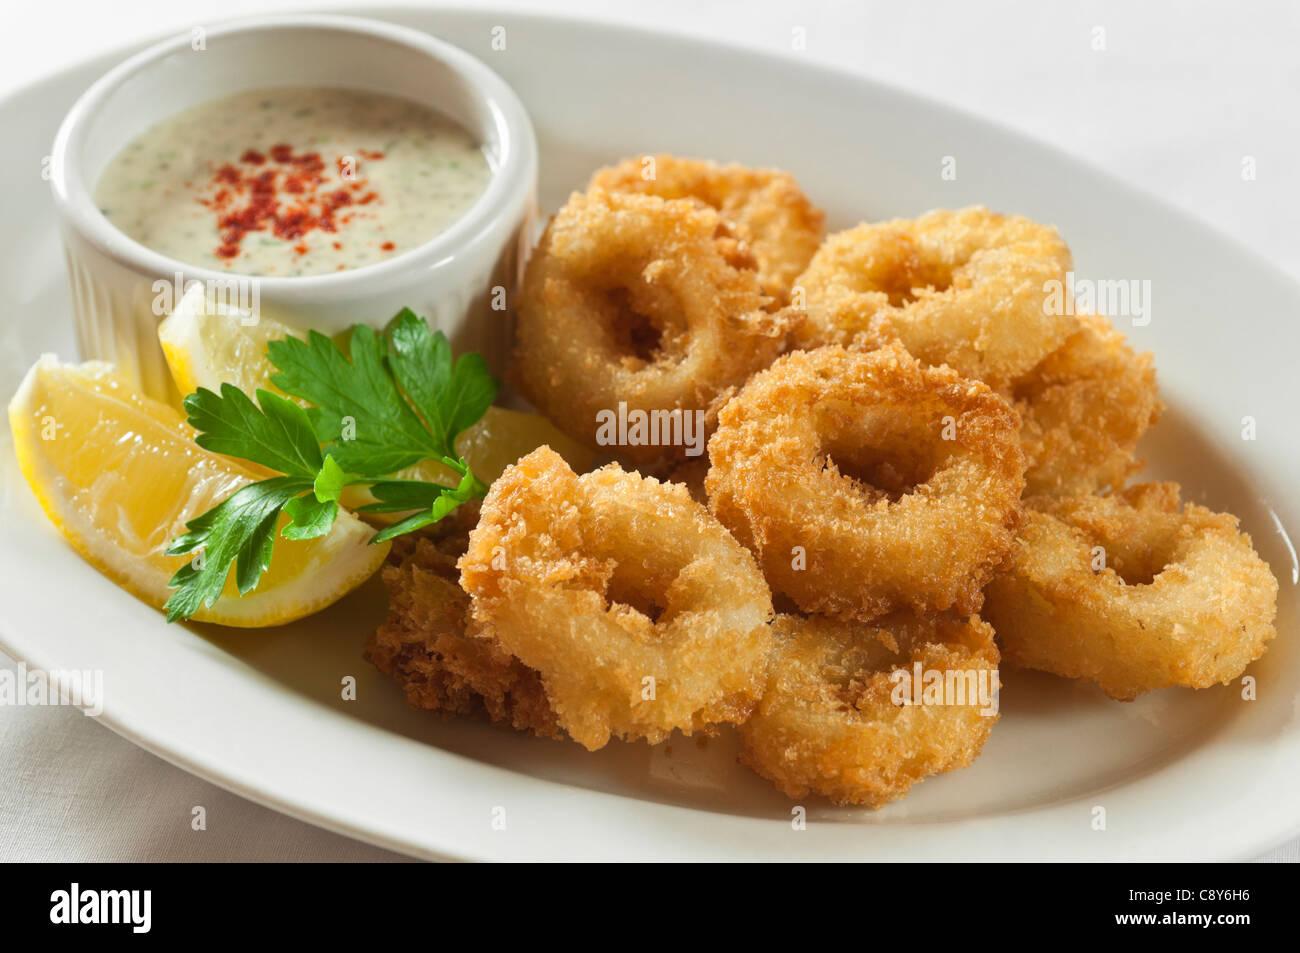 Deep fried calamari or squid - Stock Image